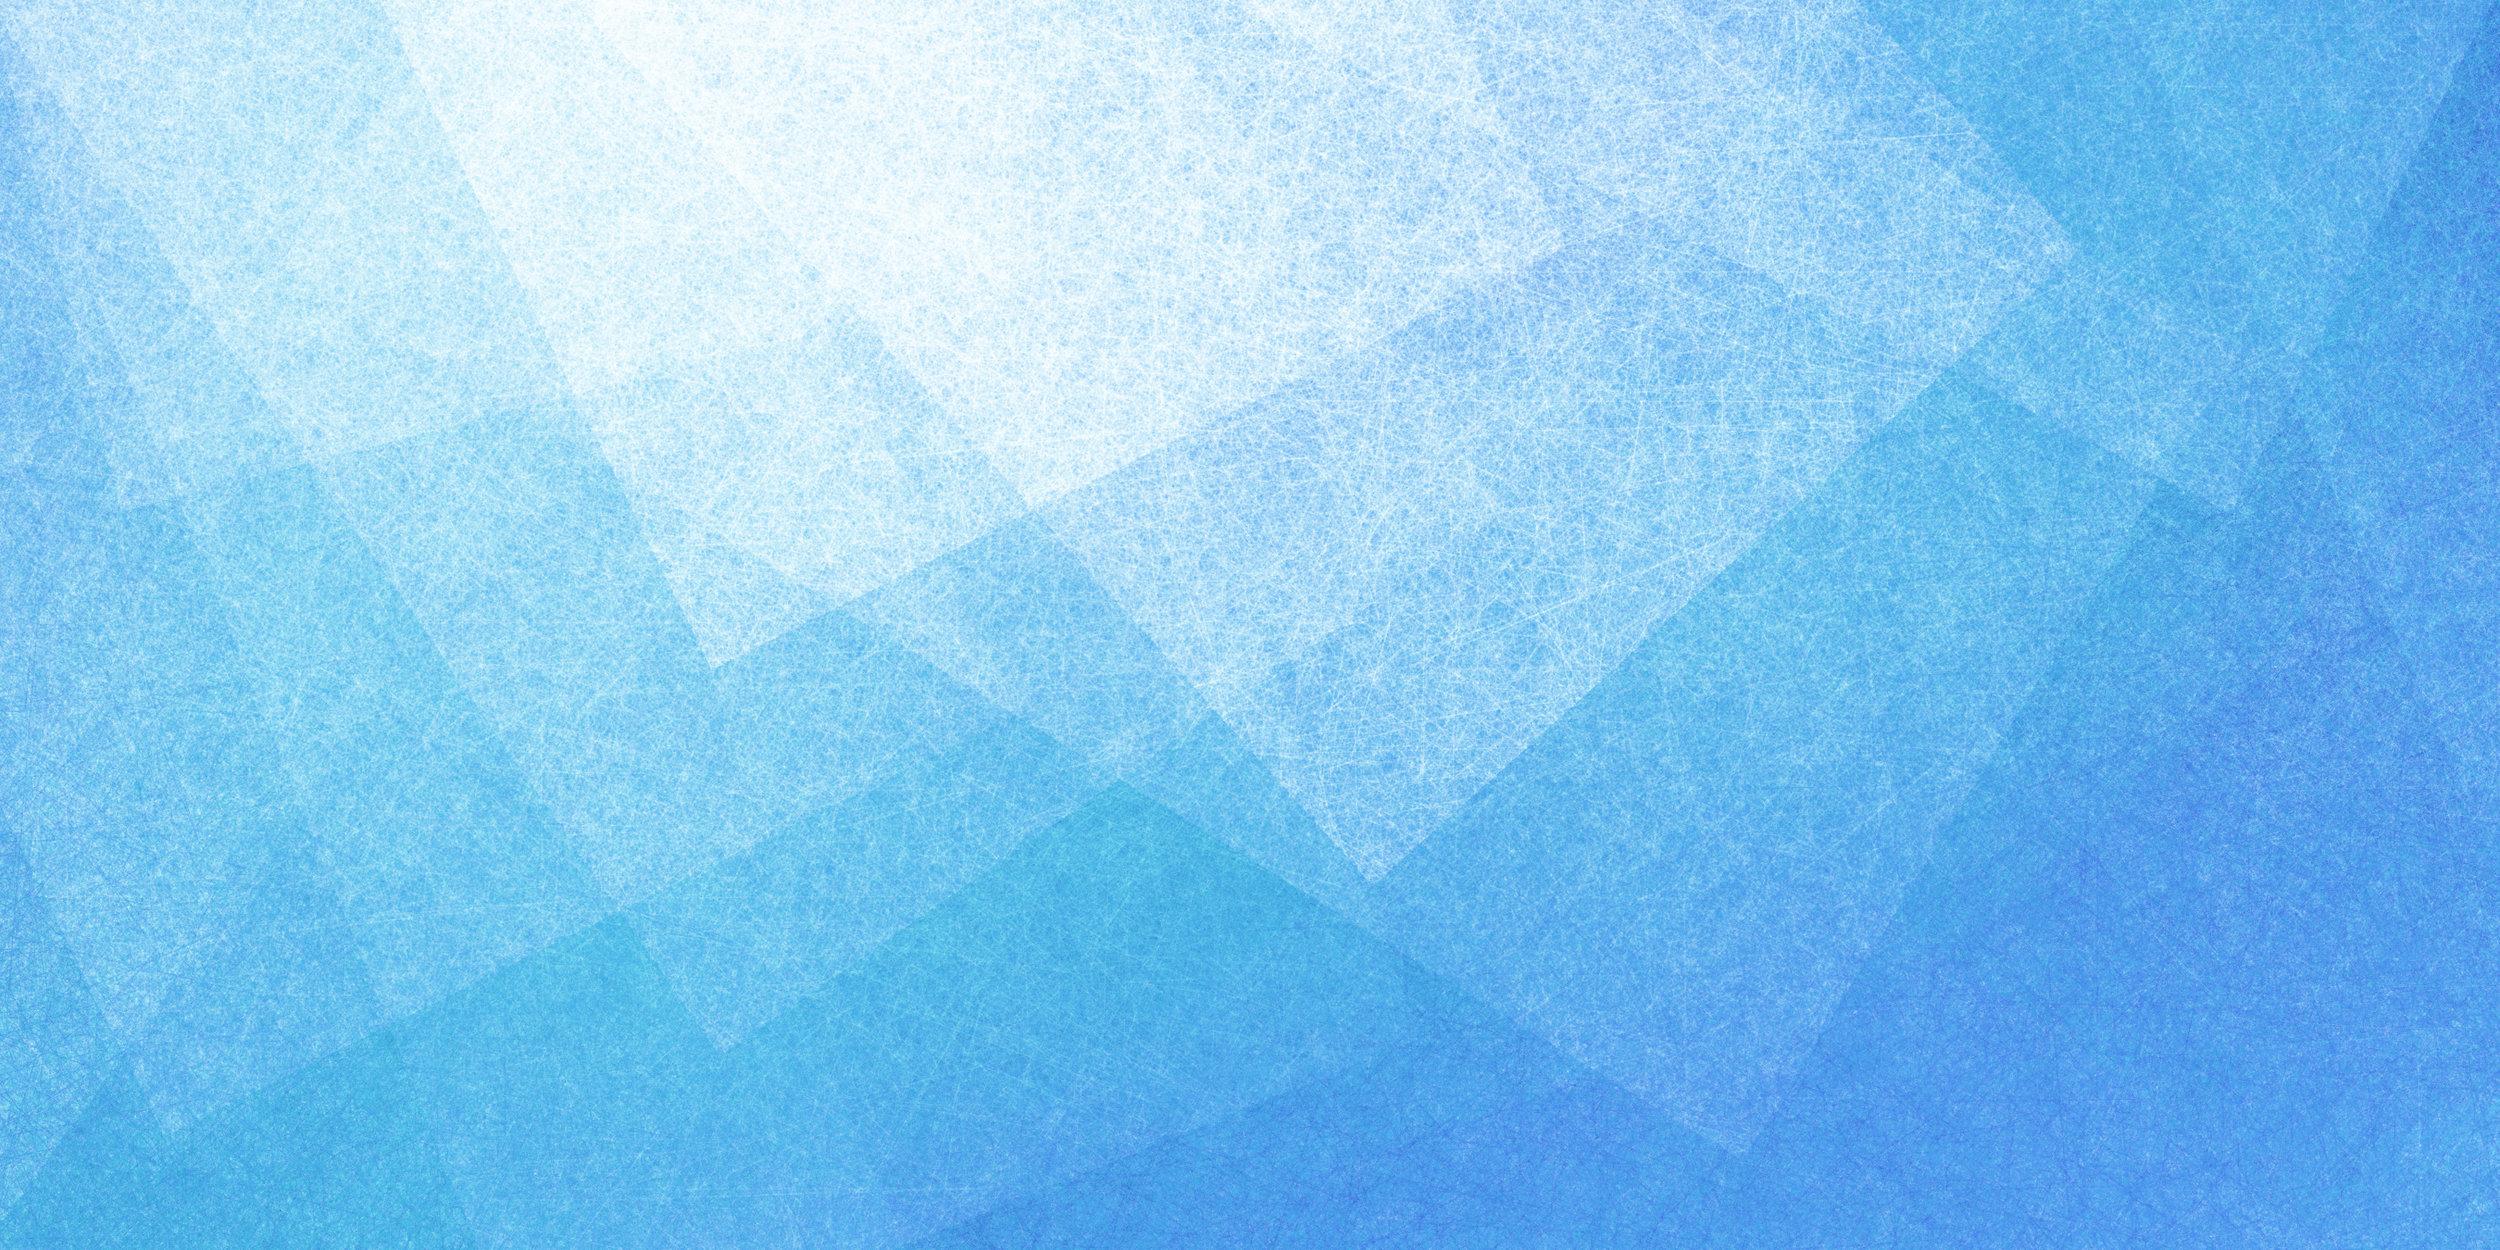 Blue_Background_104134300_2.jpg